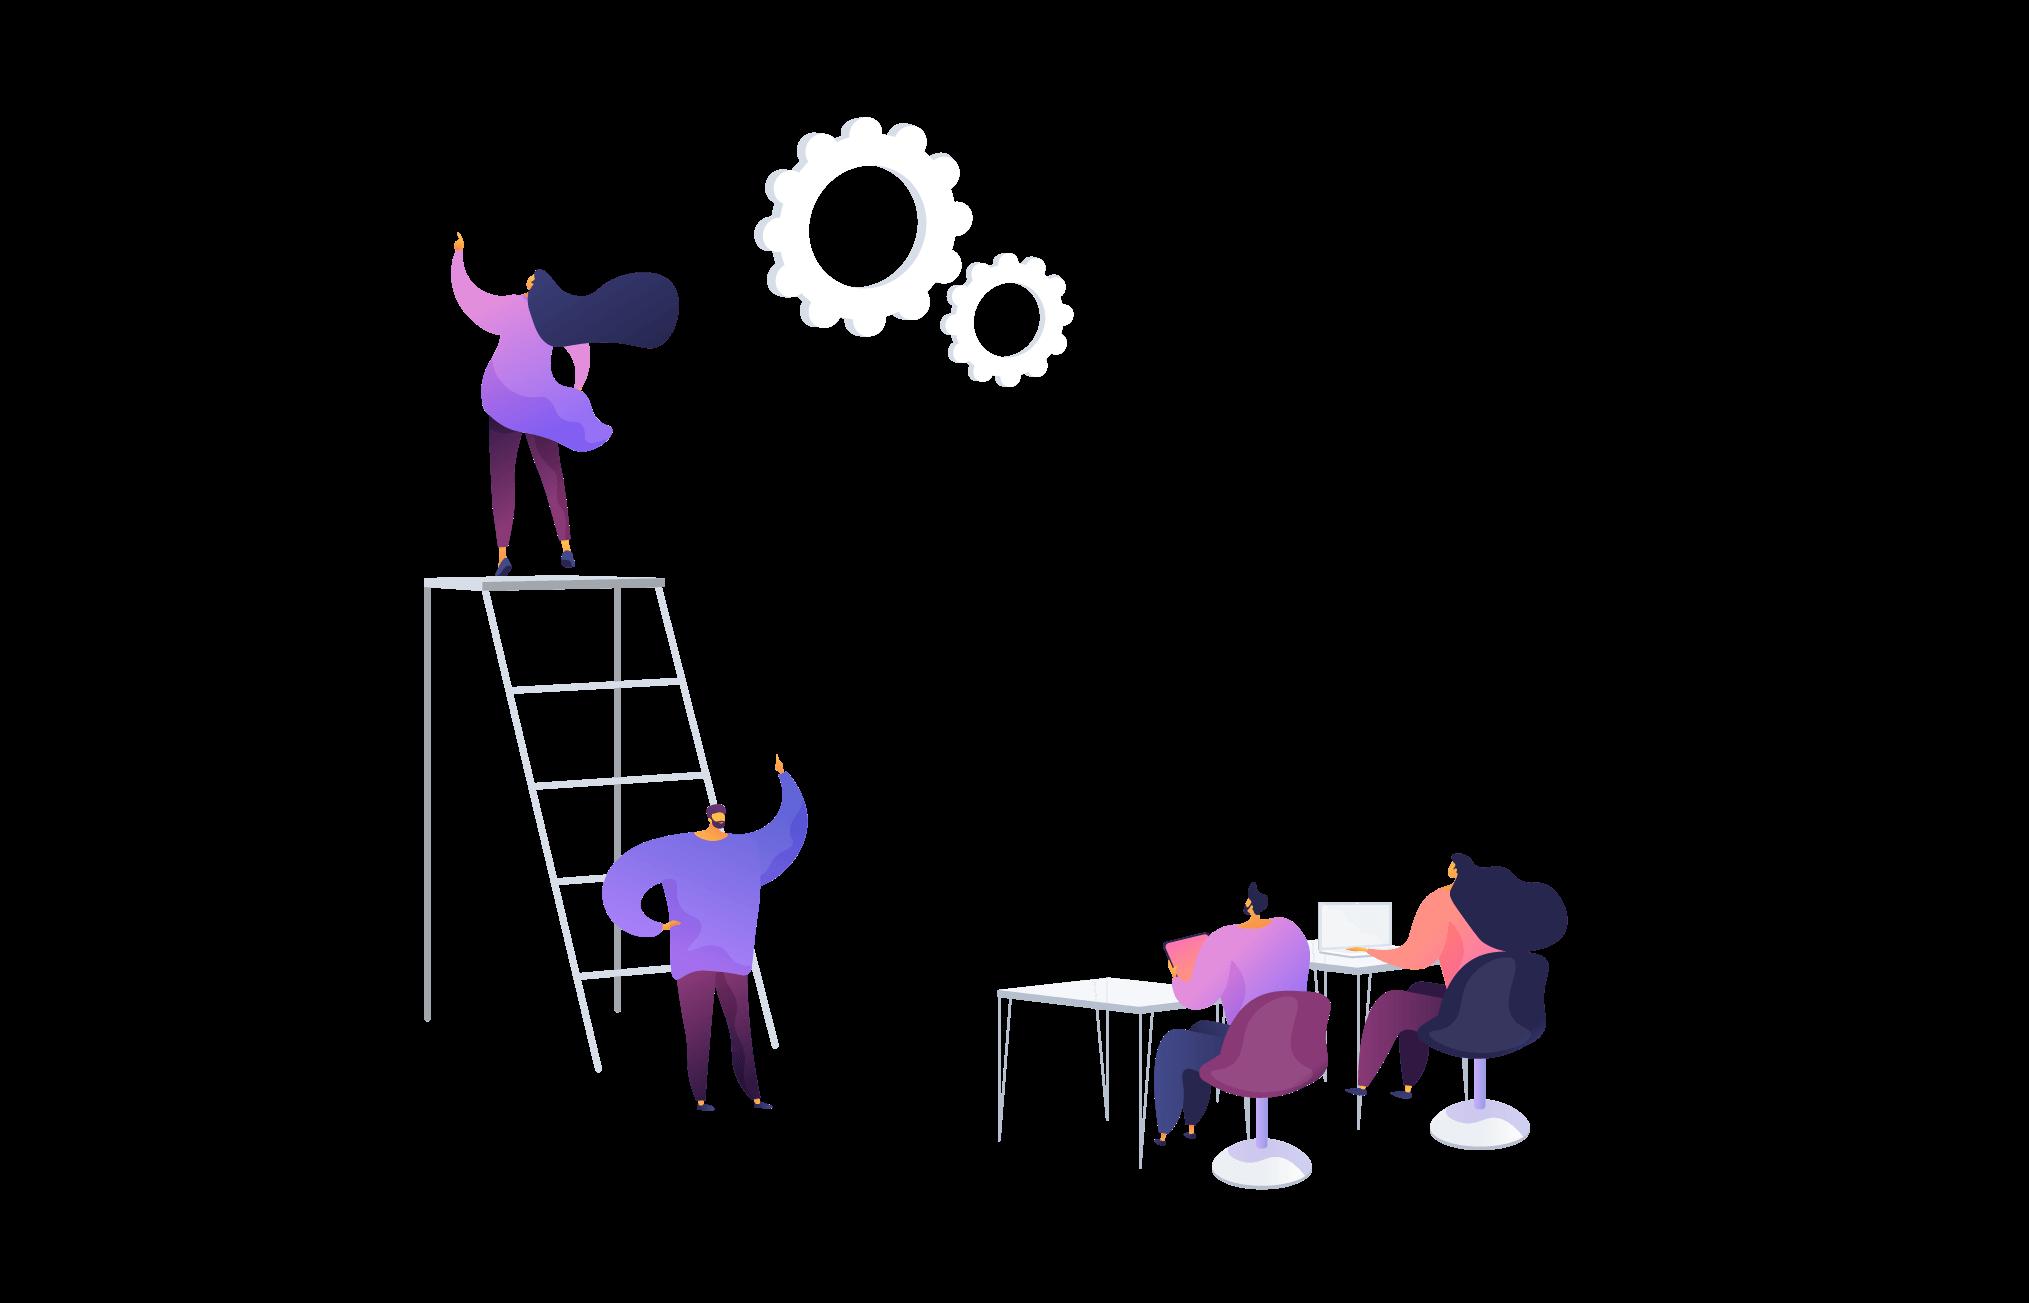 software development company, team, web applications and website development, web development services, qa testing, software qa tester, smoke and sanity testing, web design company, application support services, data analytics consultants